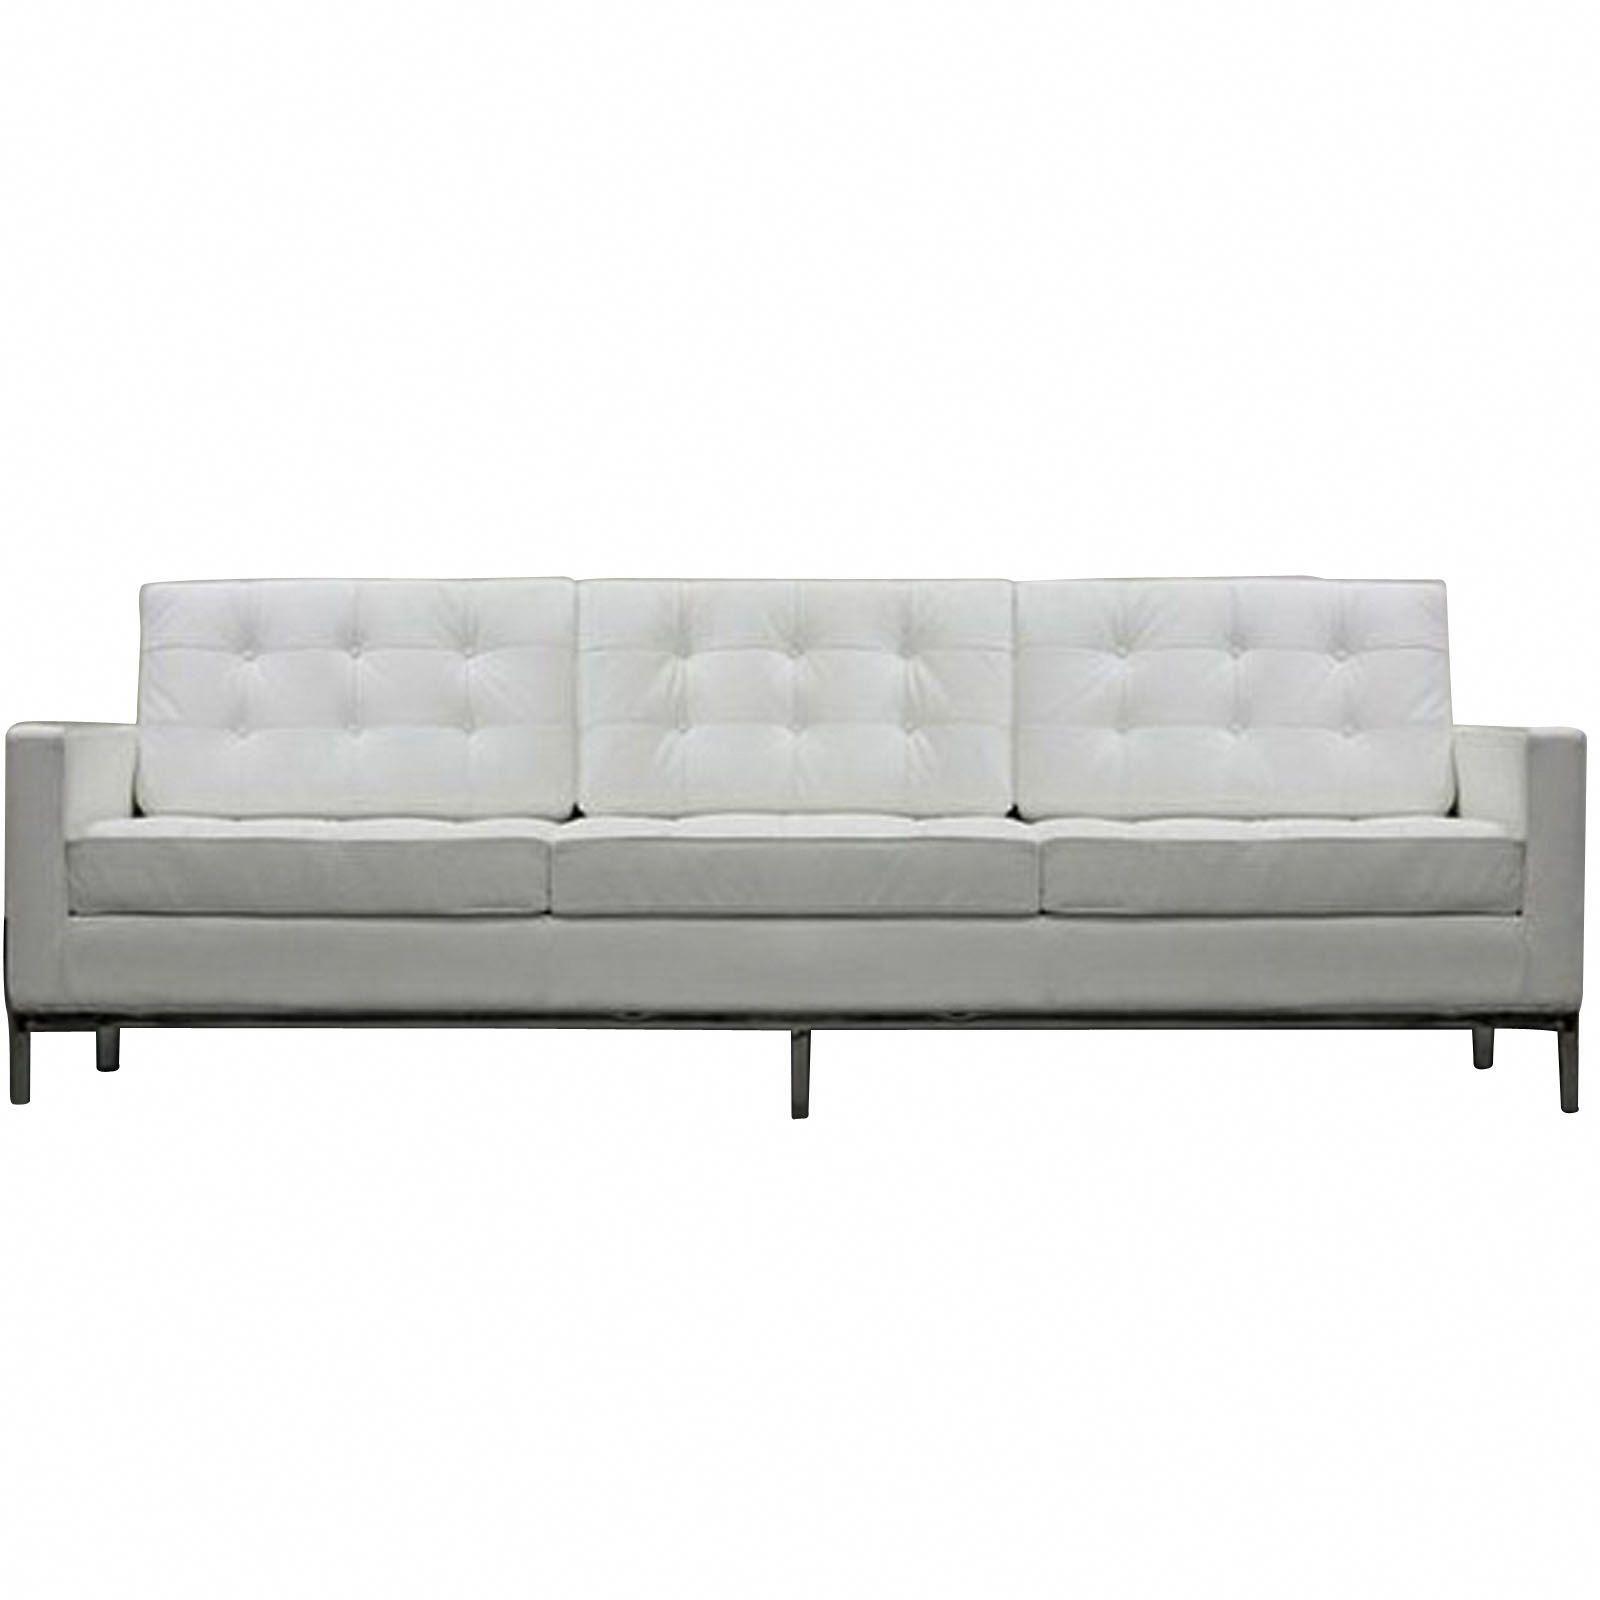 Bateman White Leather Sofa A Few Black Leather Sofa Ideas In